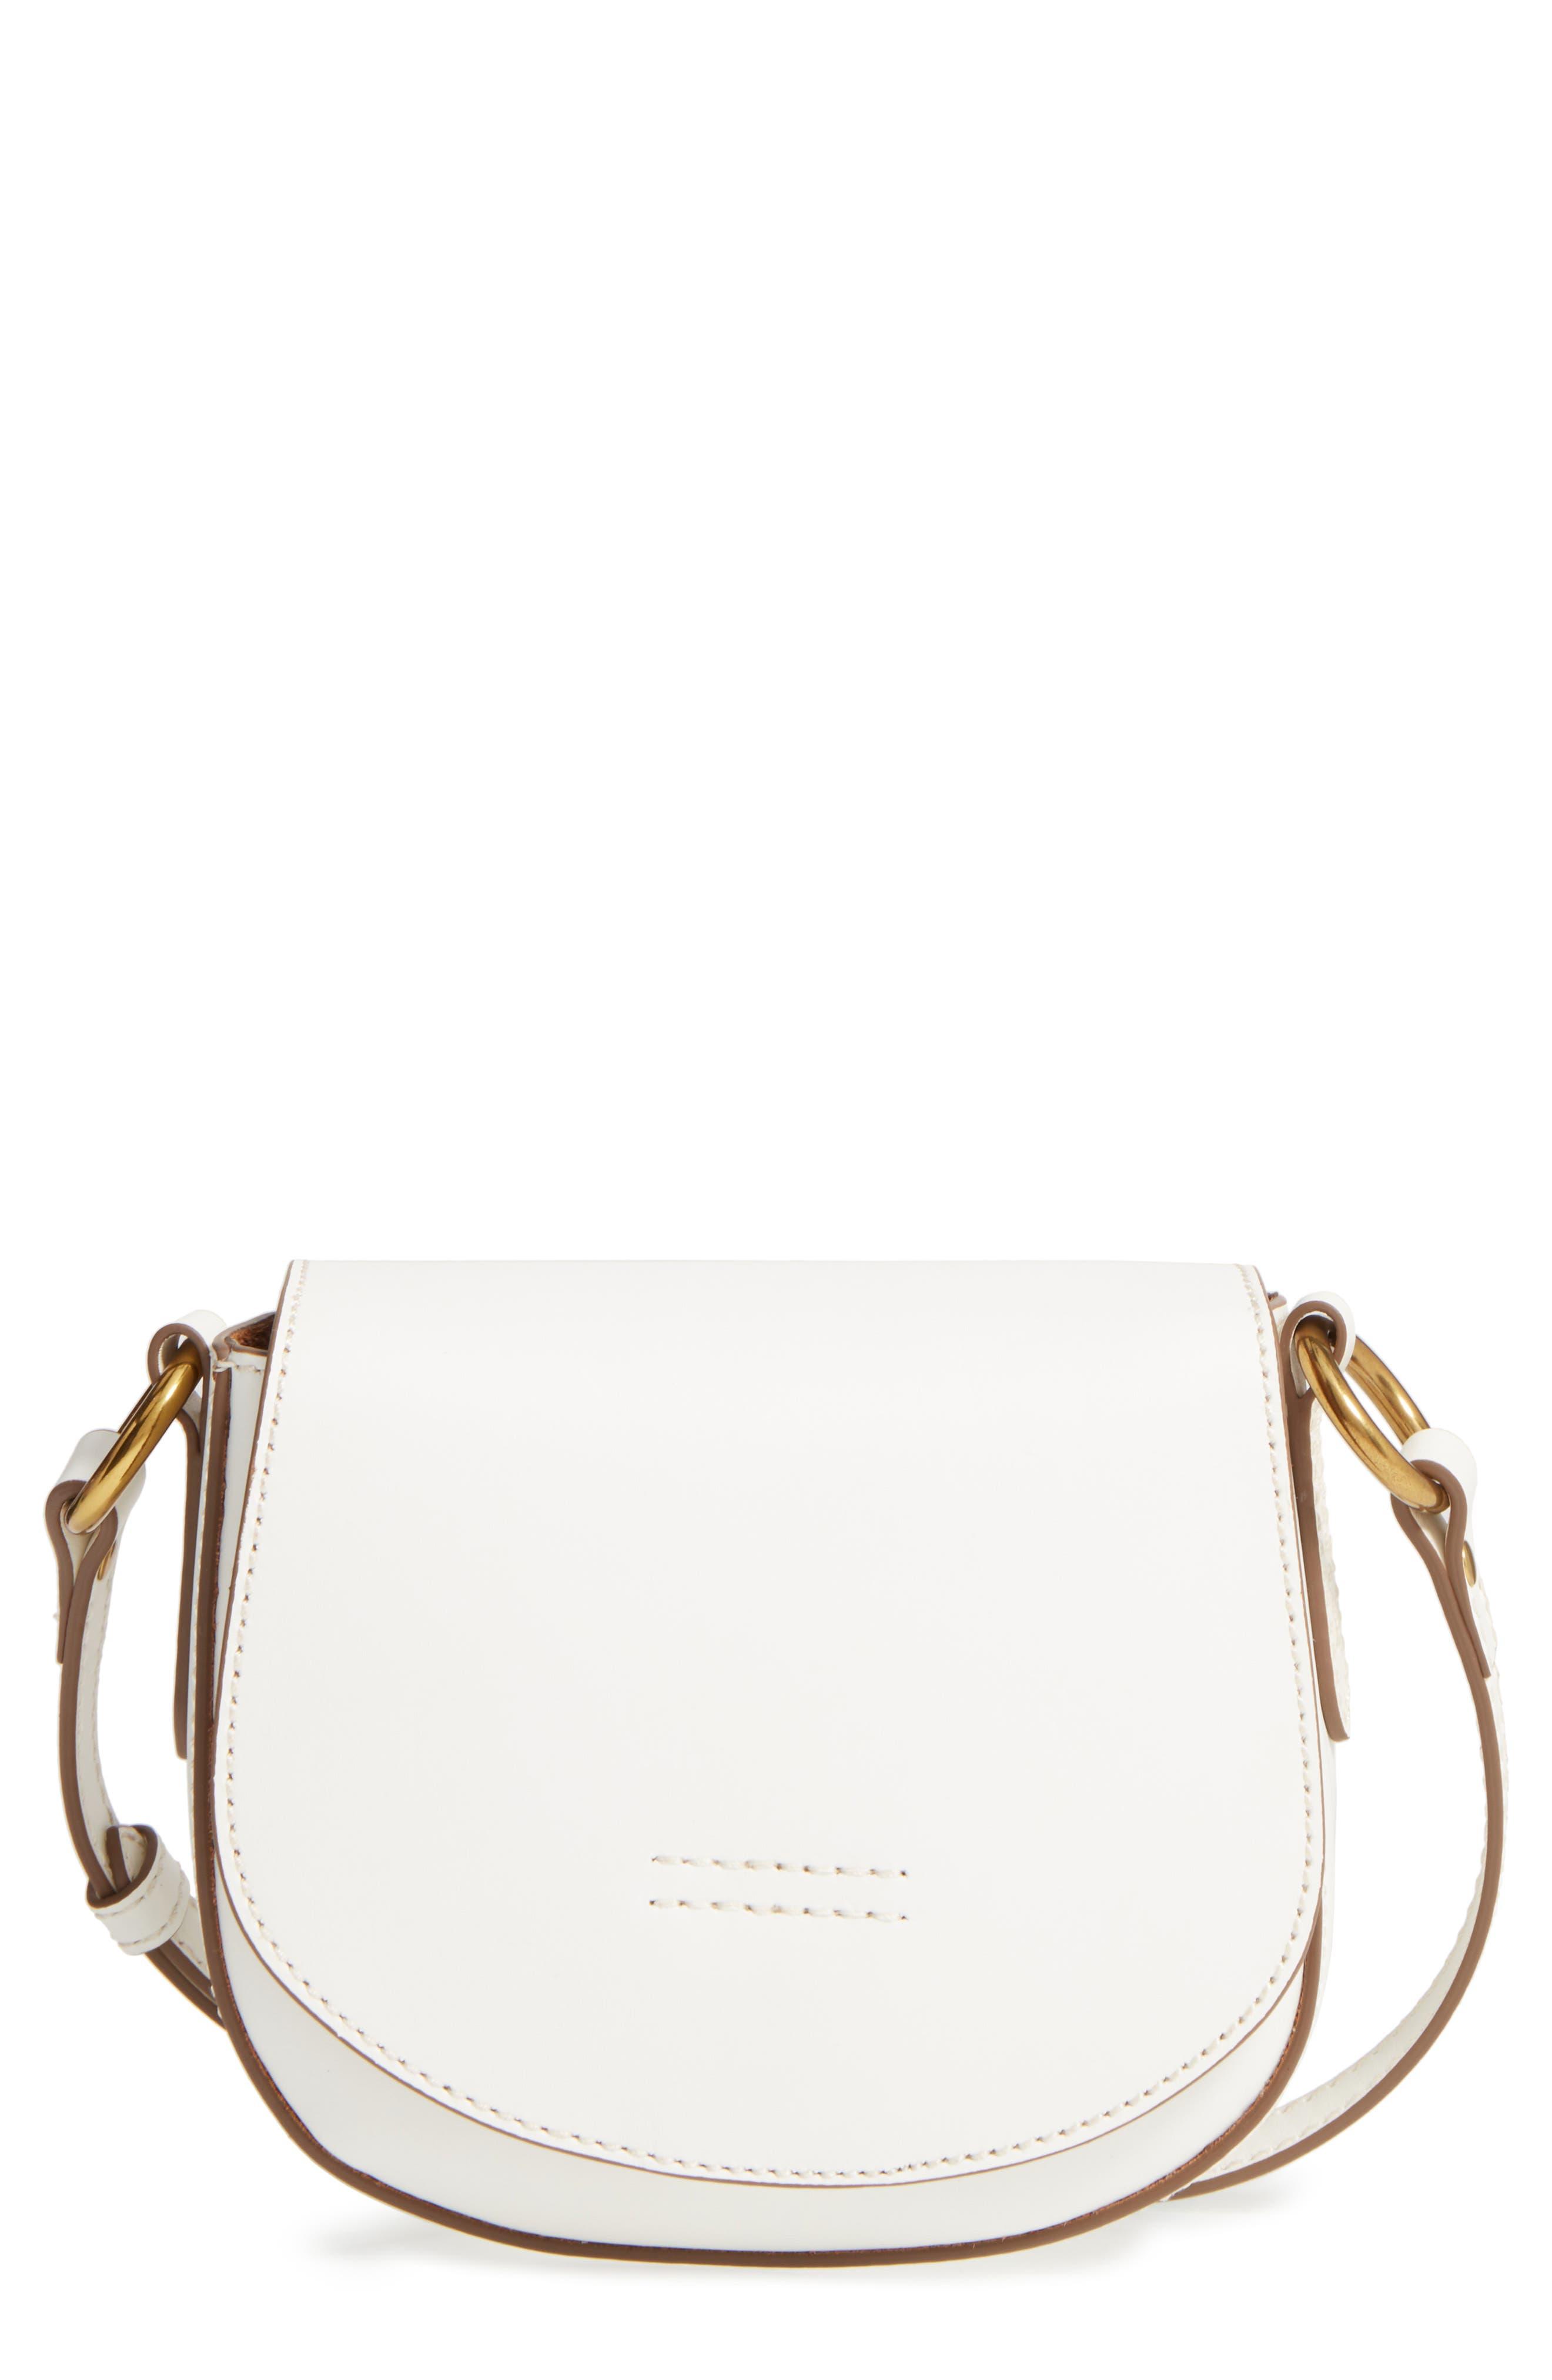 Frye Small Harness Calfskin Leather Saddle Bag